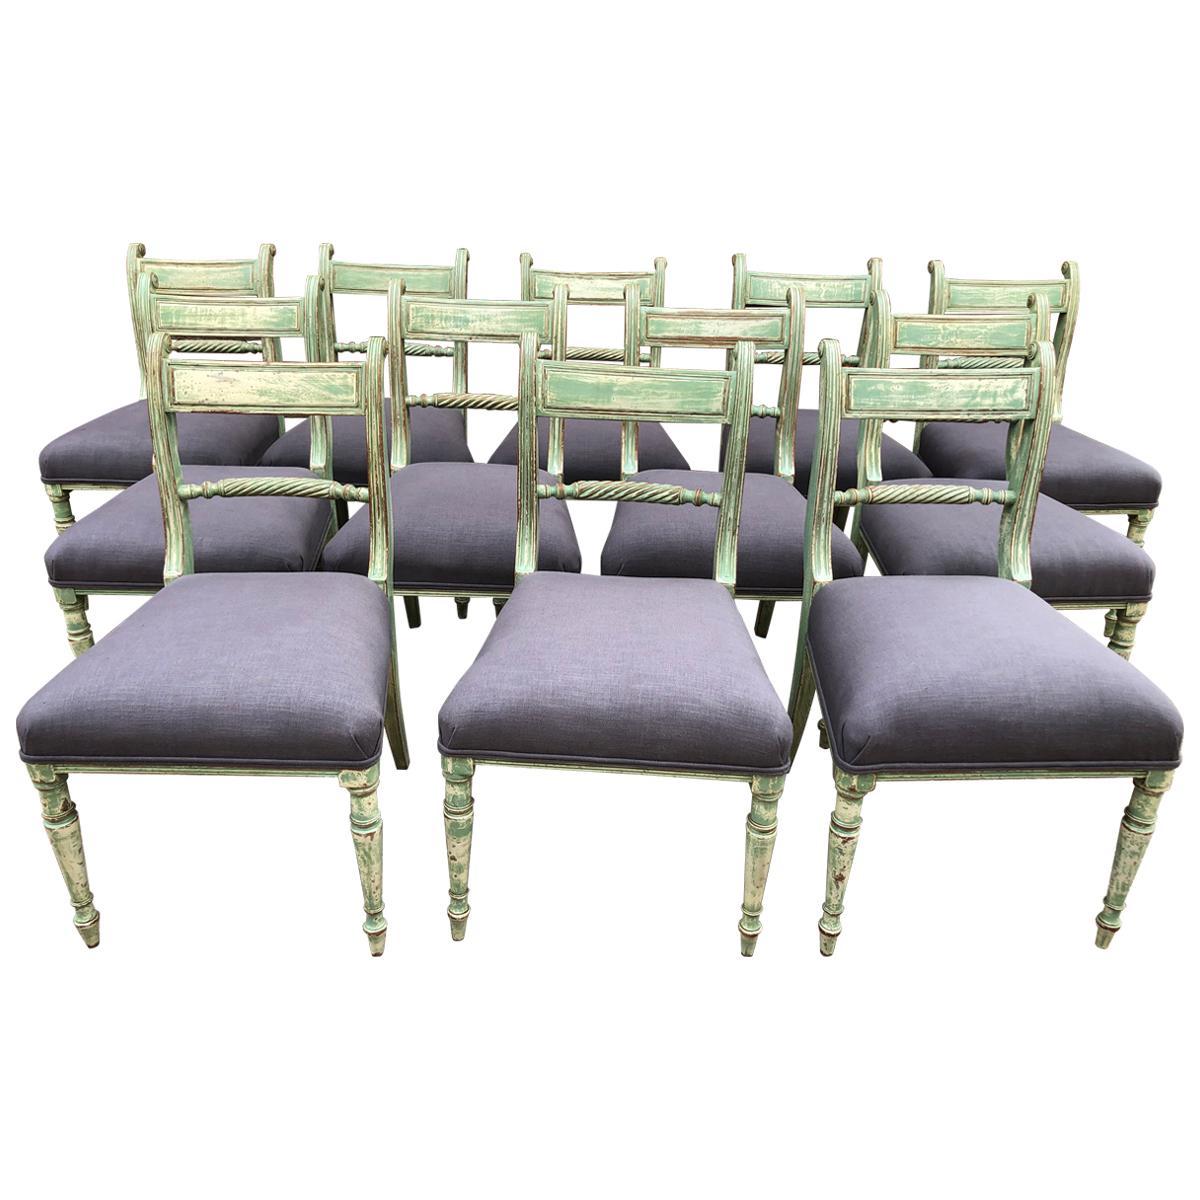 12 Regency Painted Mahogany Chairs